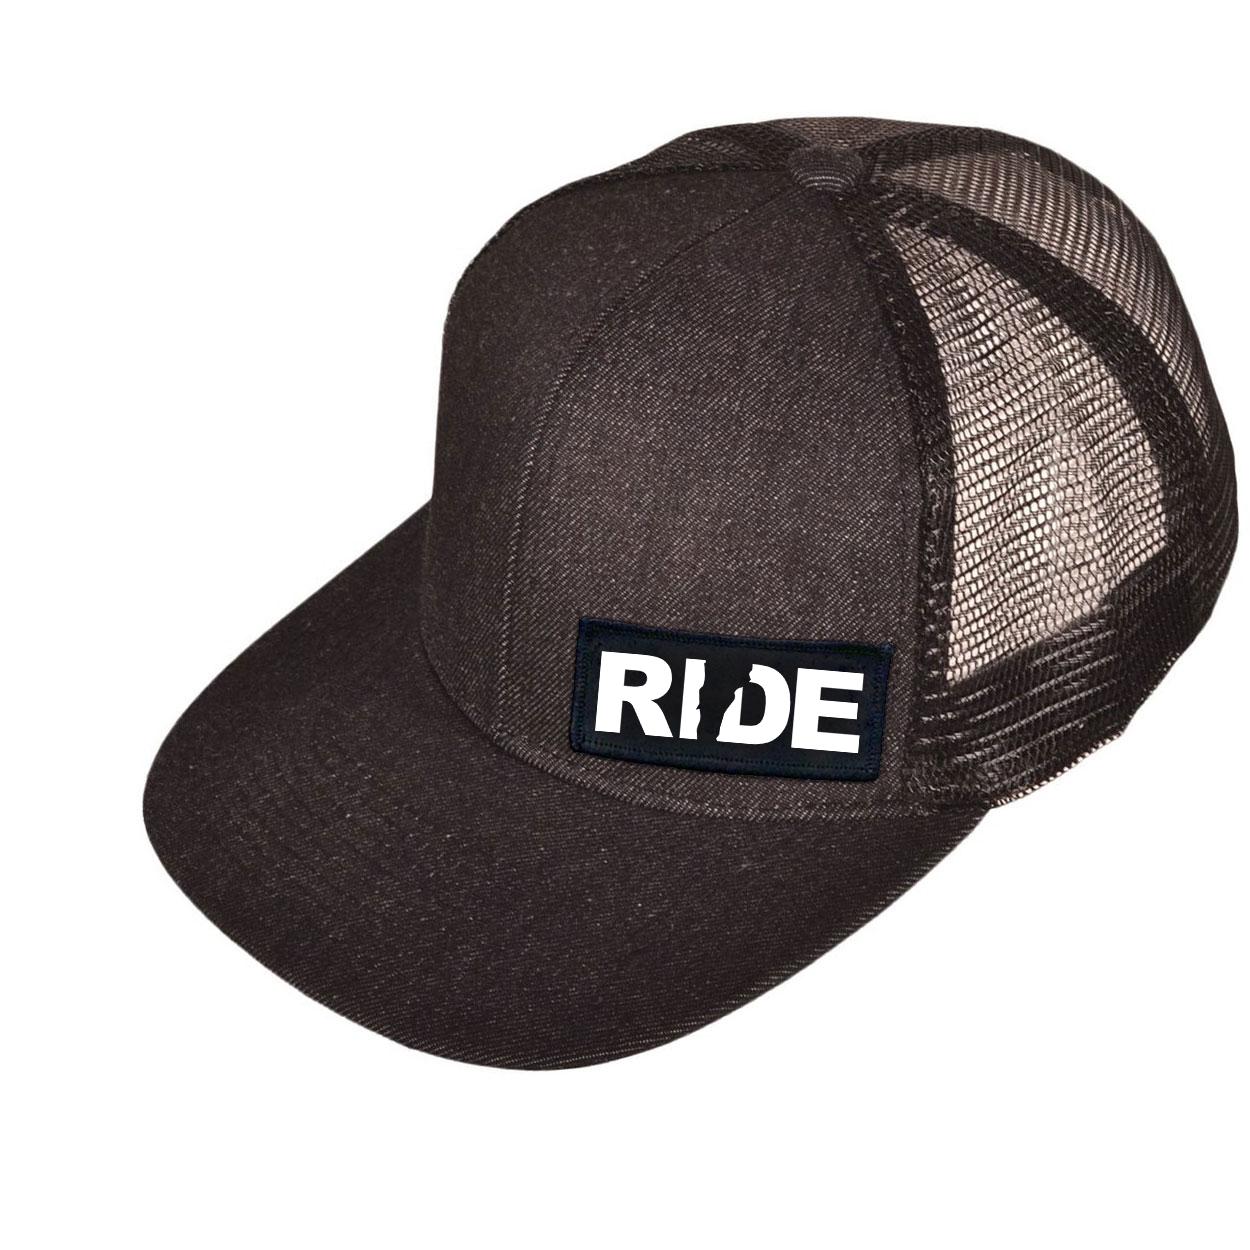 Ride Vermont Night Out Woven Patch Snapback Flat Brim Hat Black Denim (White Logo)